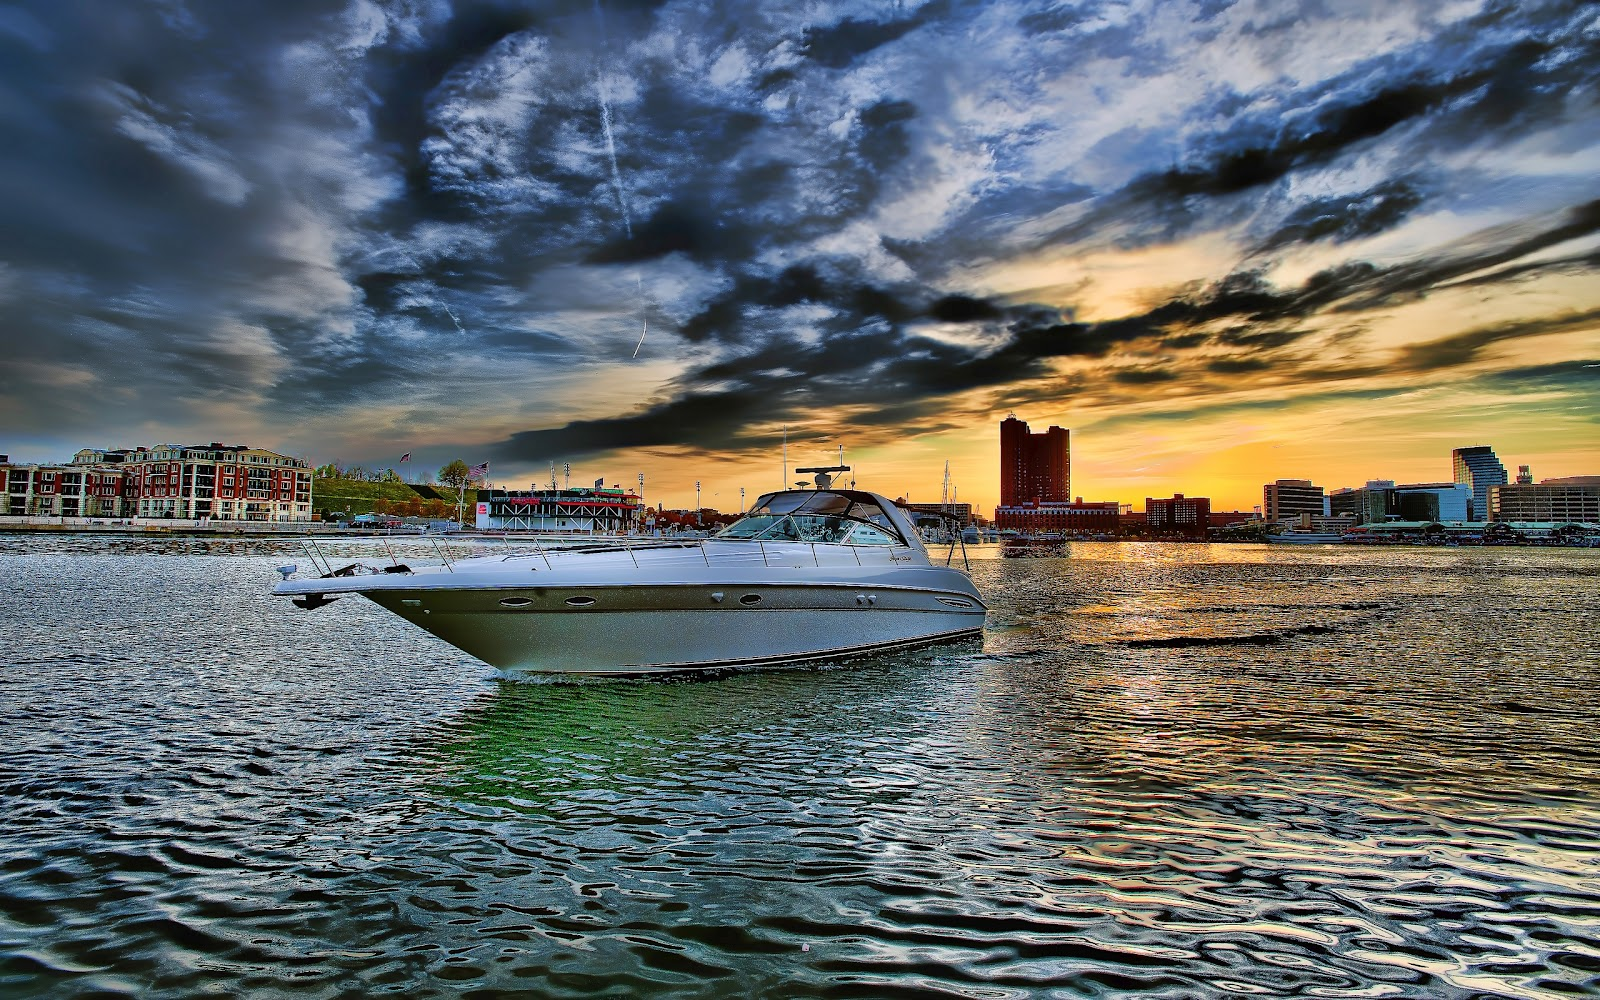 City Boat FullHD Beach Water Nature Background Wallpaper Widescreen 1600x1000